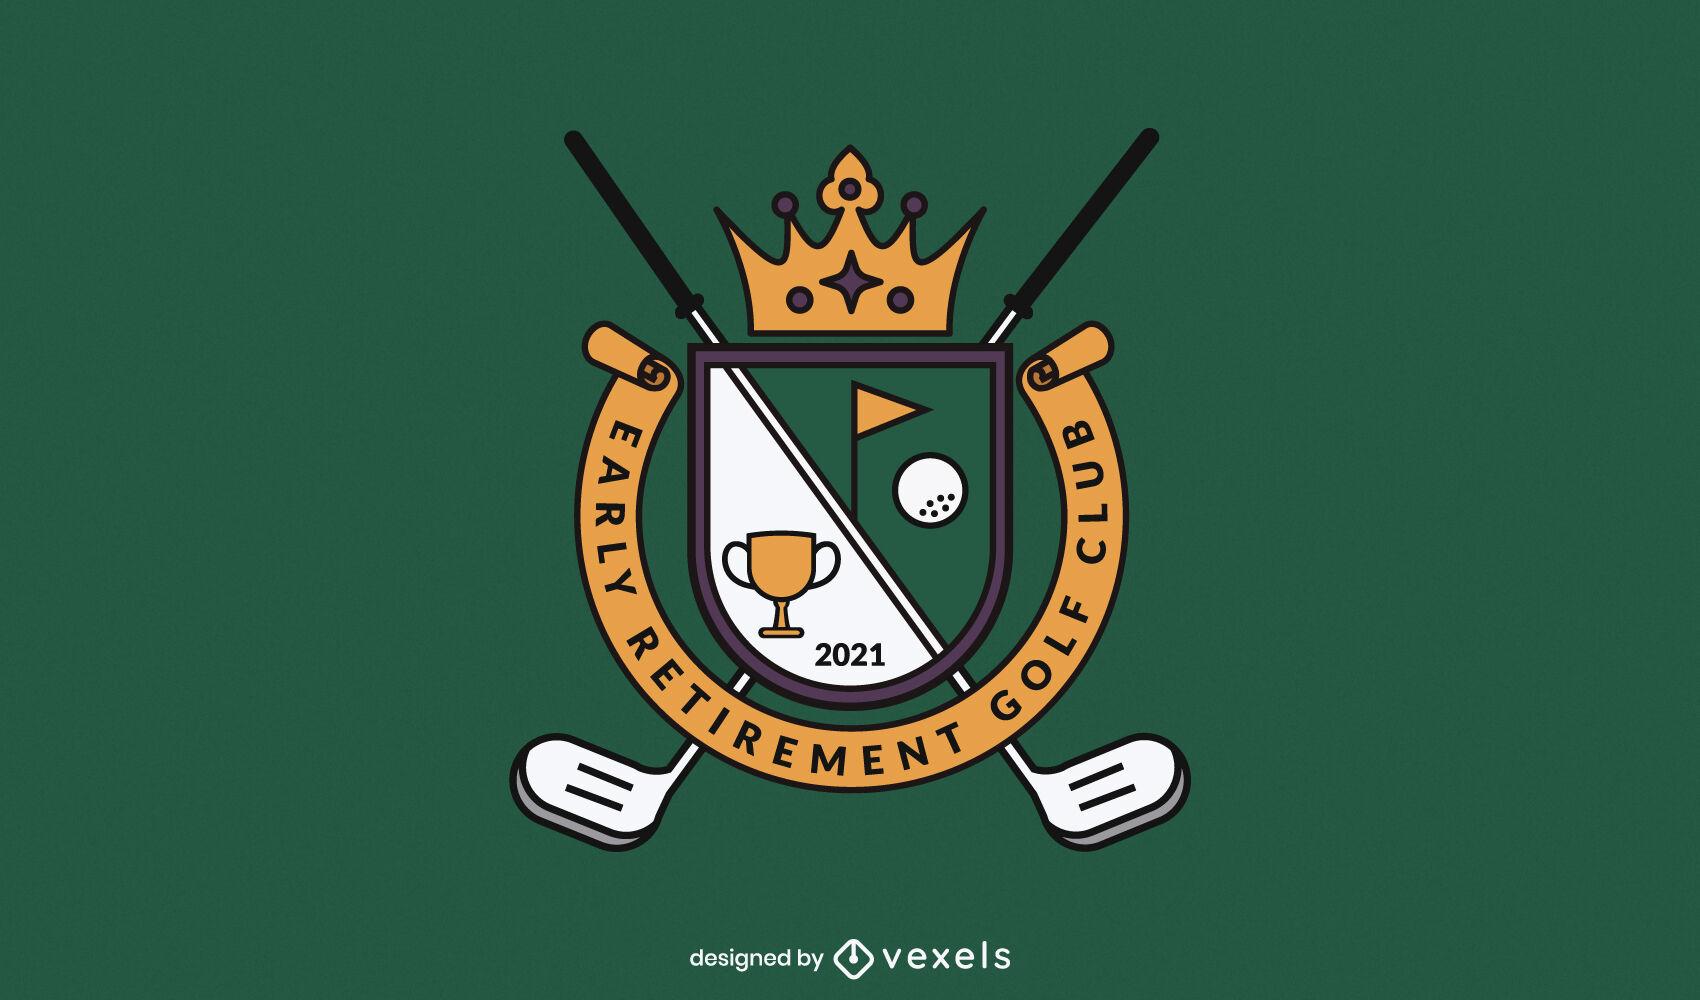 Golf sport equipment business logo design